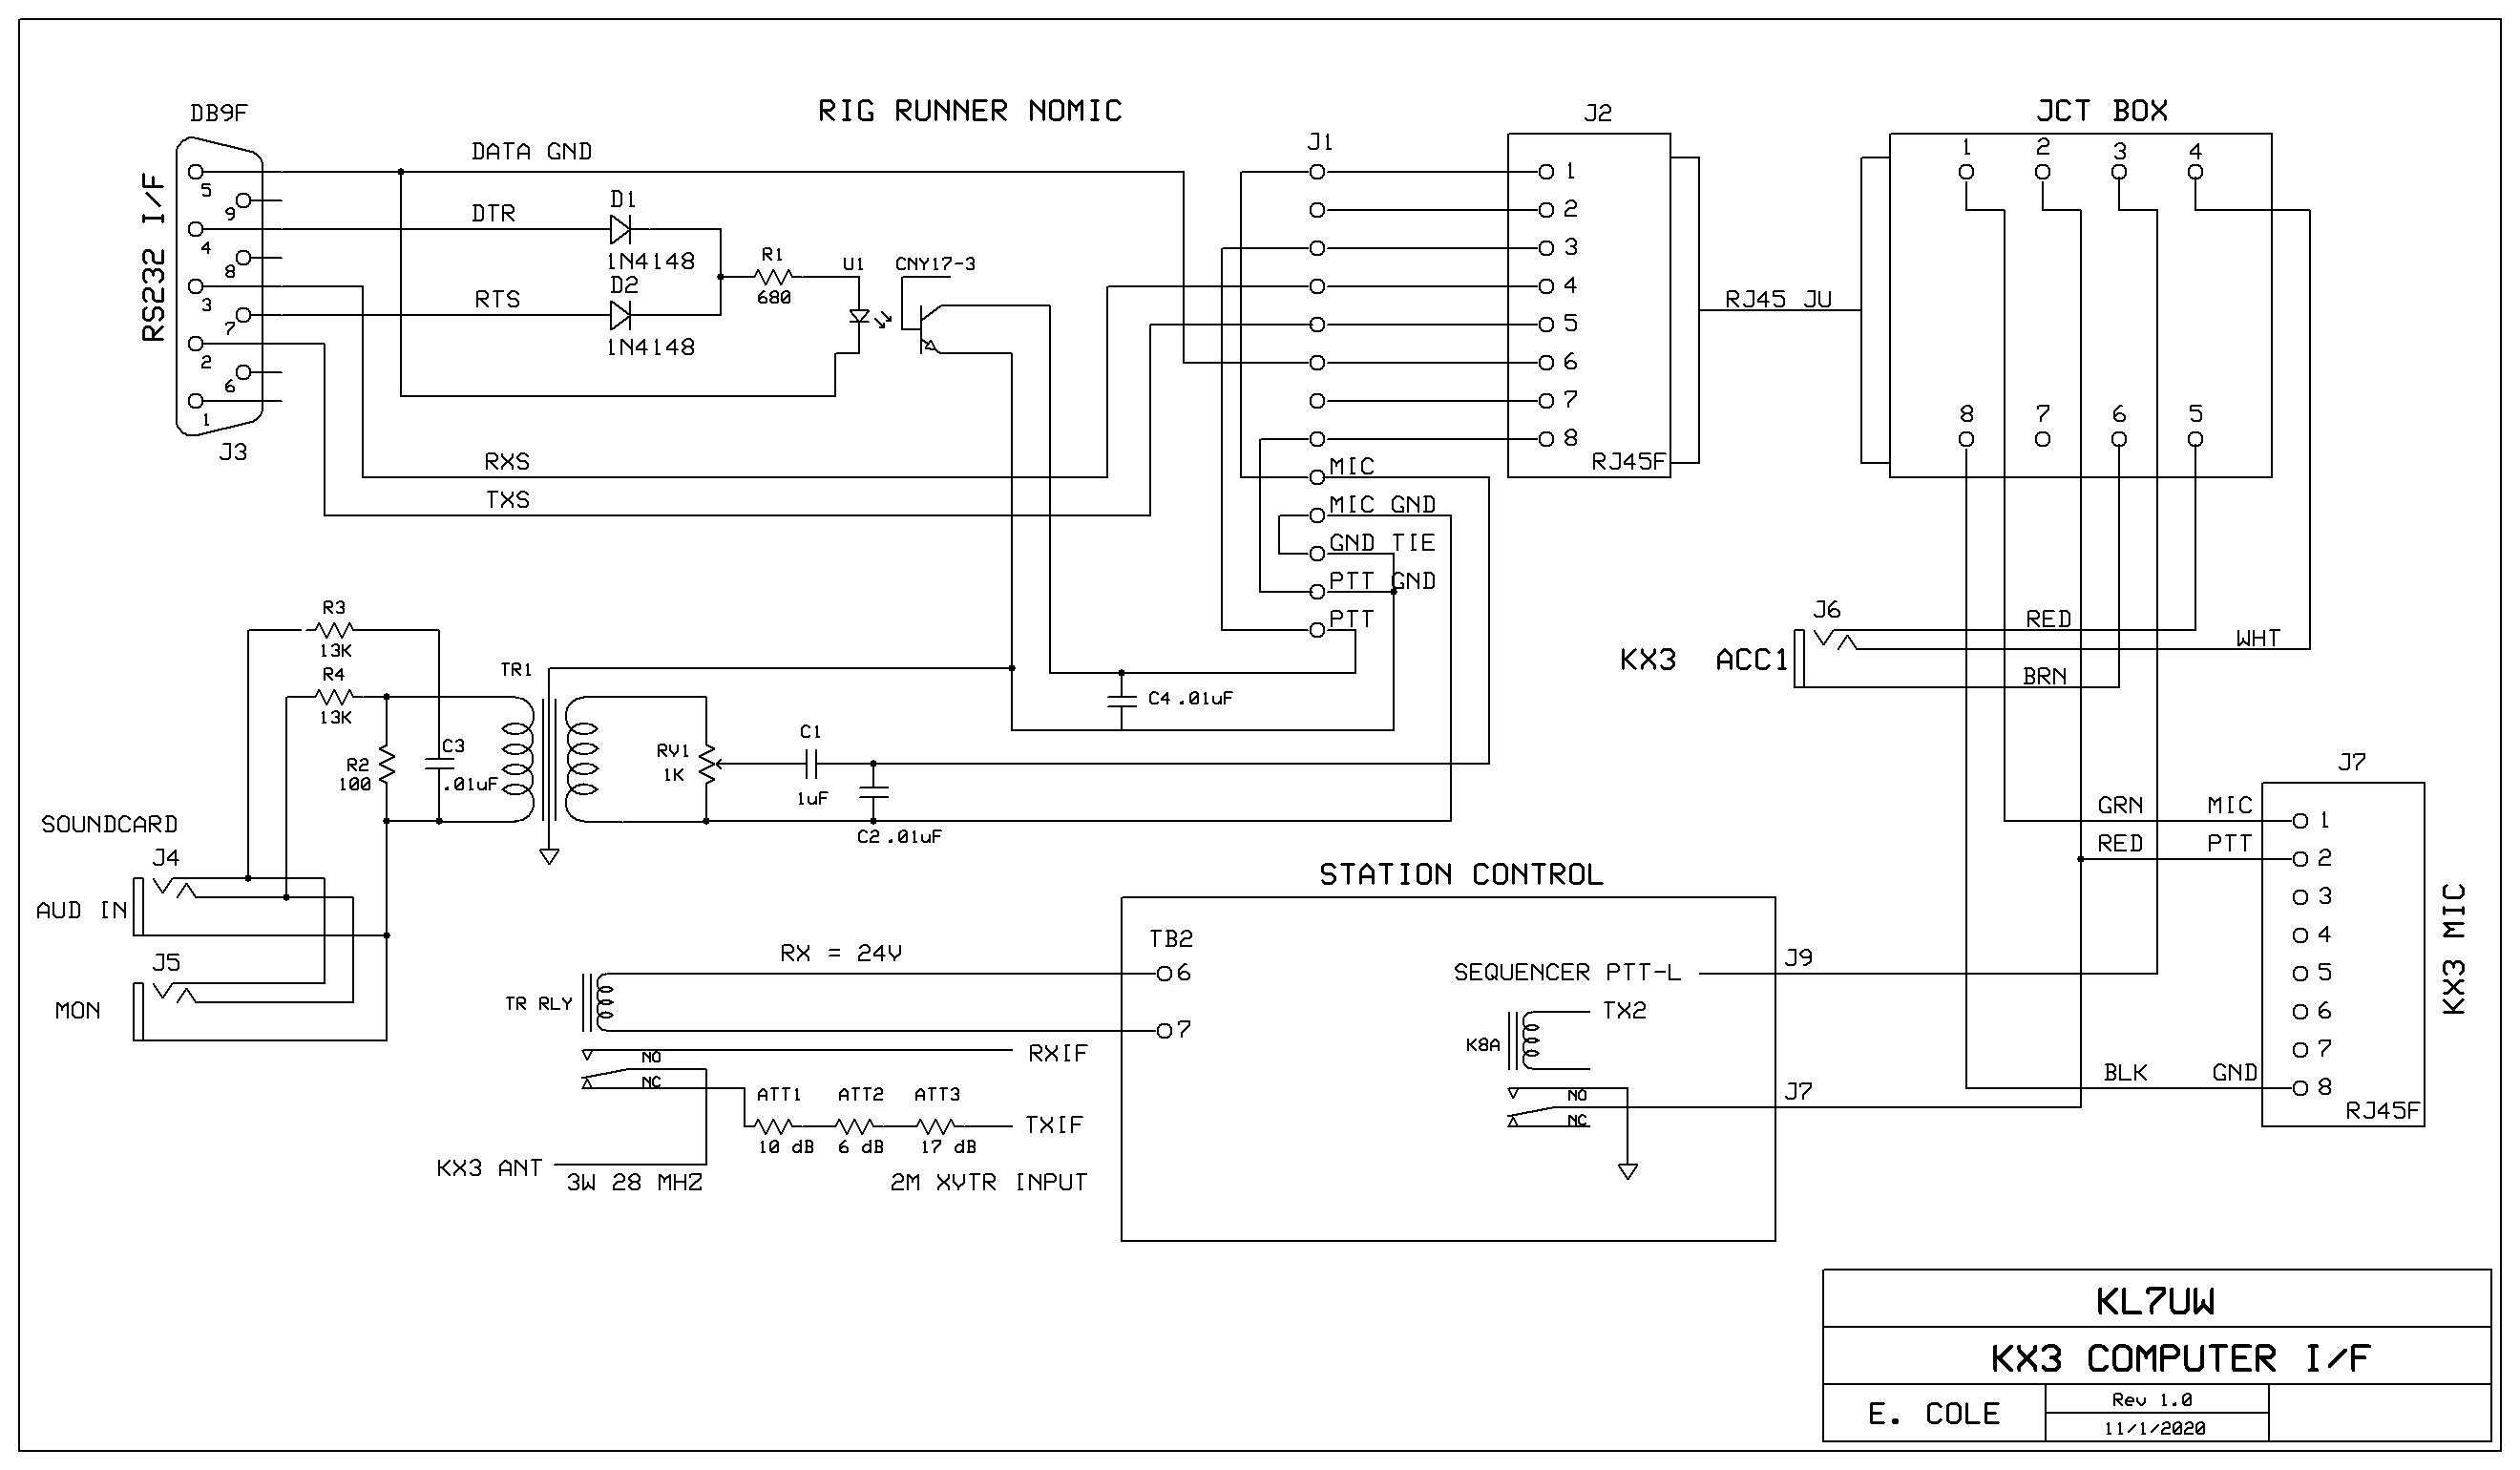 Elecraft Kx3 Computer Interface